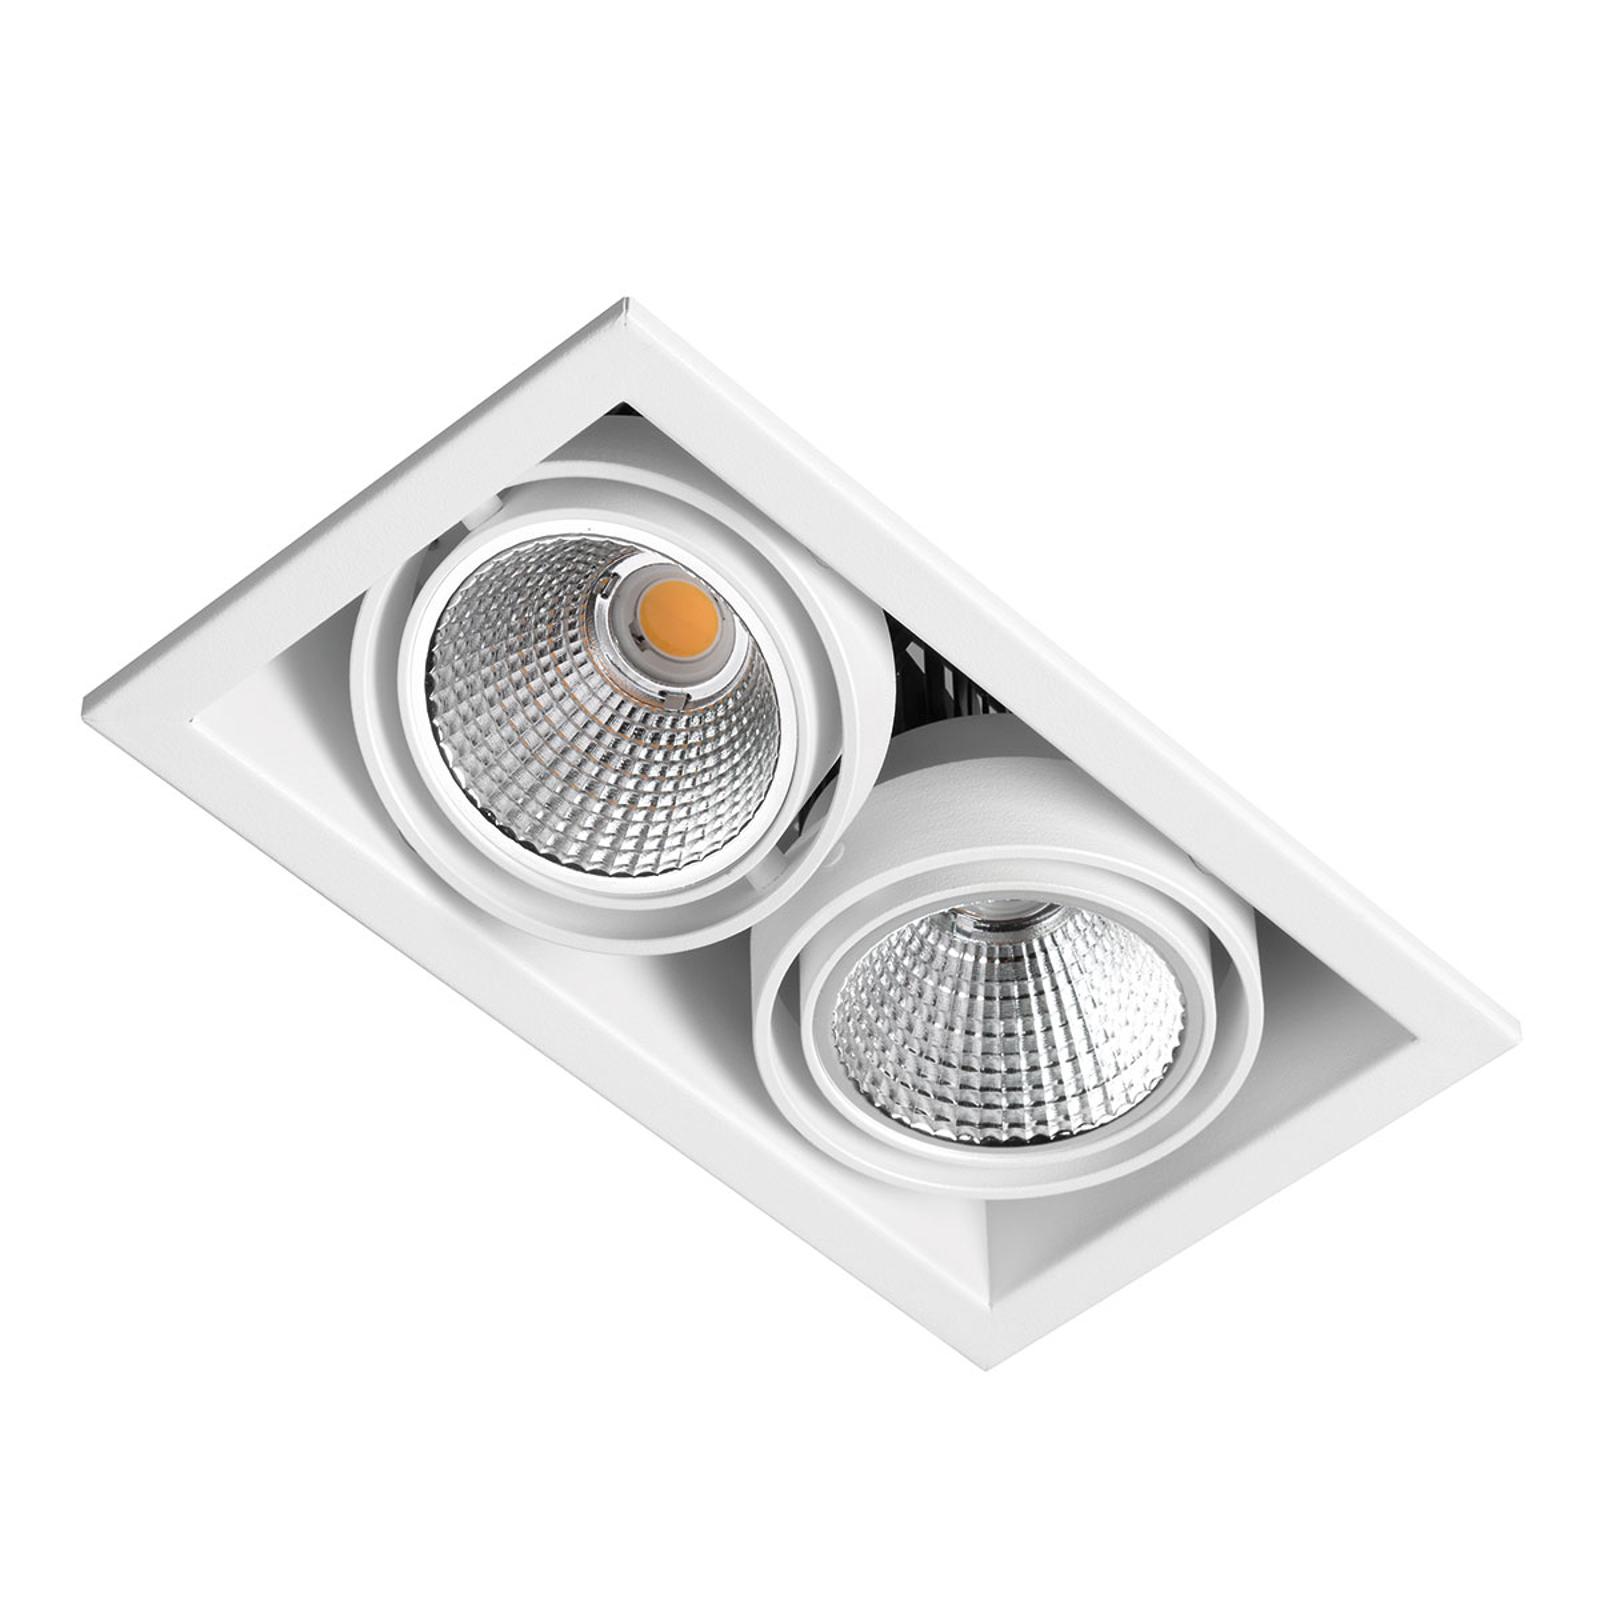 LED inbouwspot Zipar Duo Recessed 39W, 3.000K